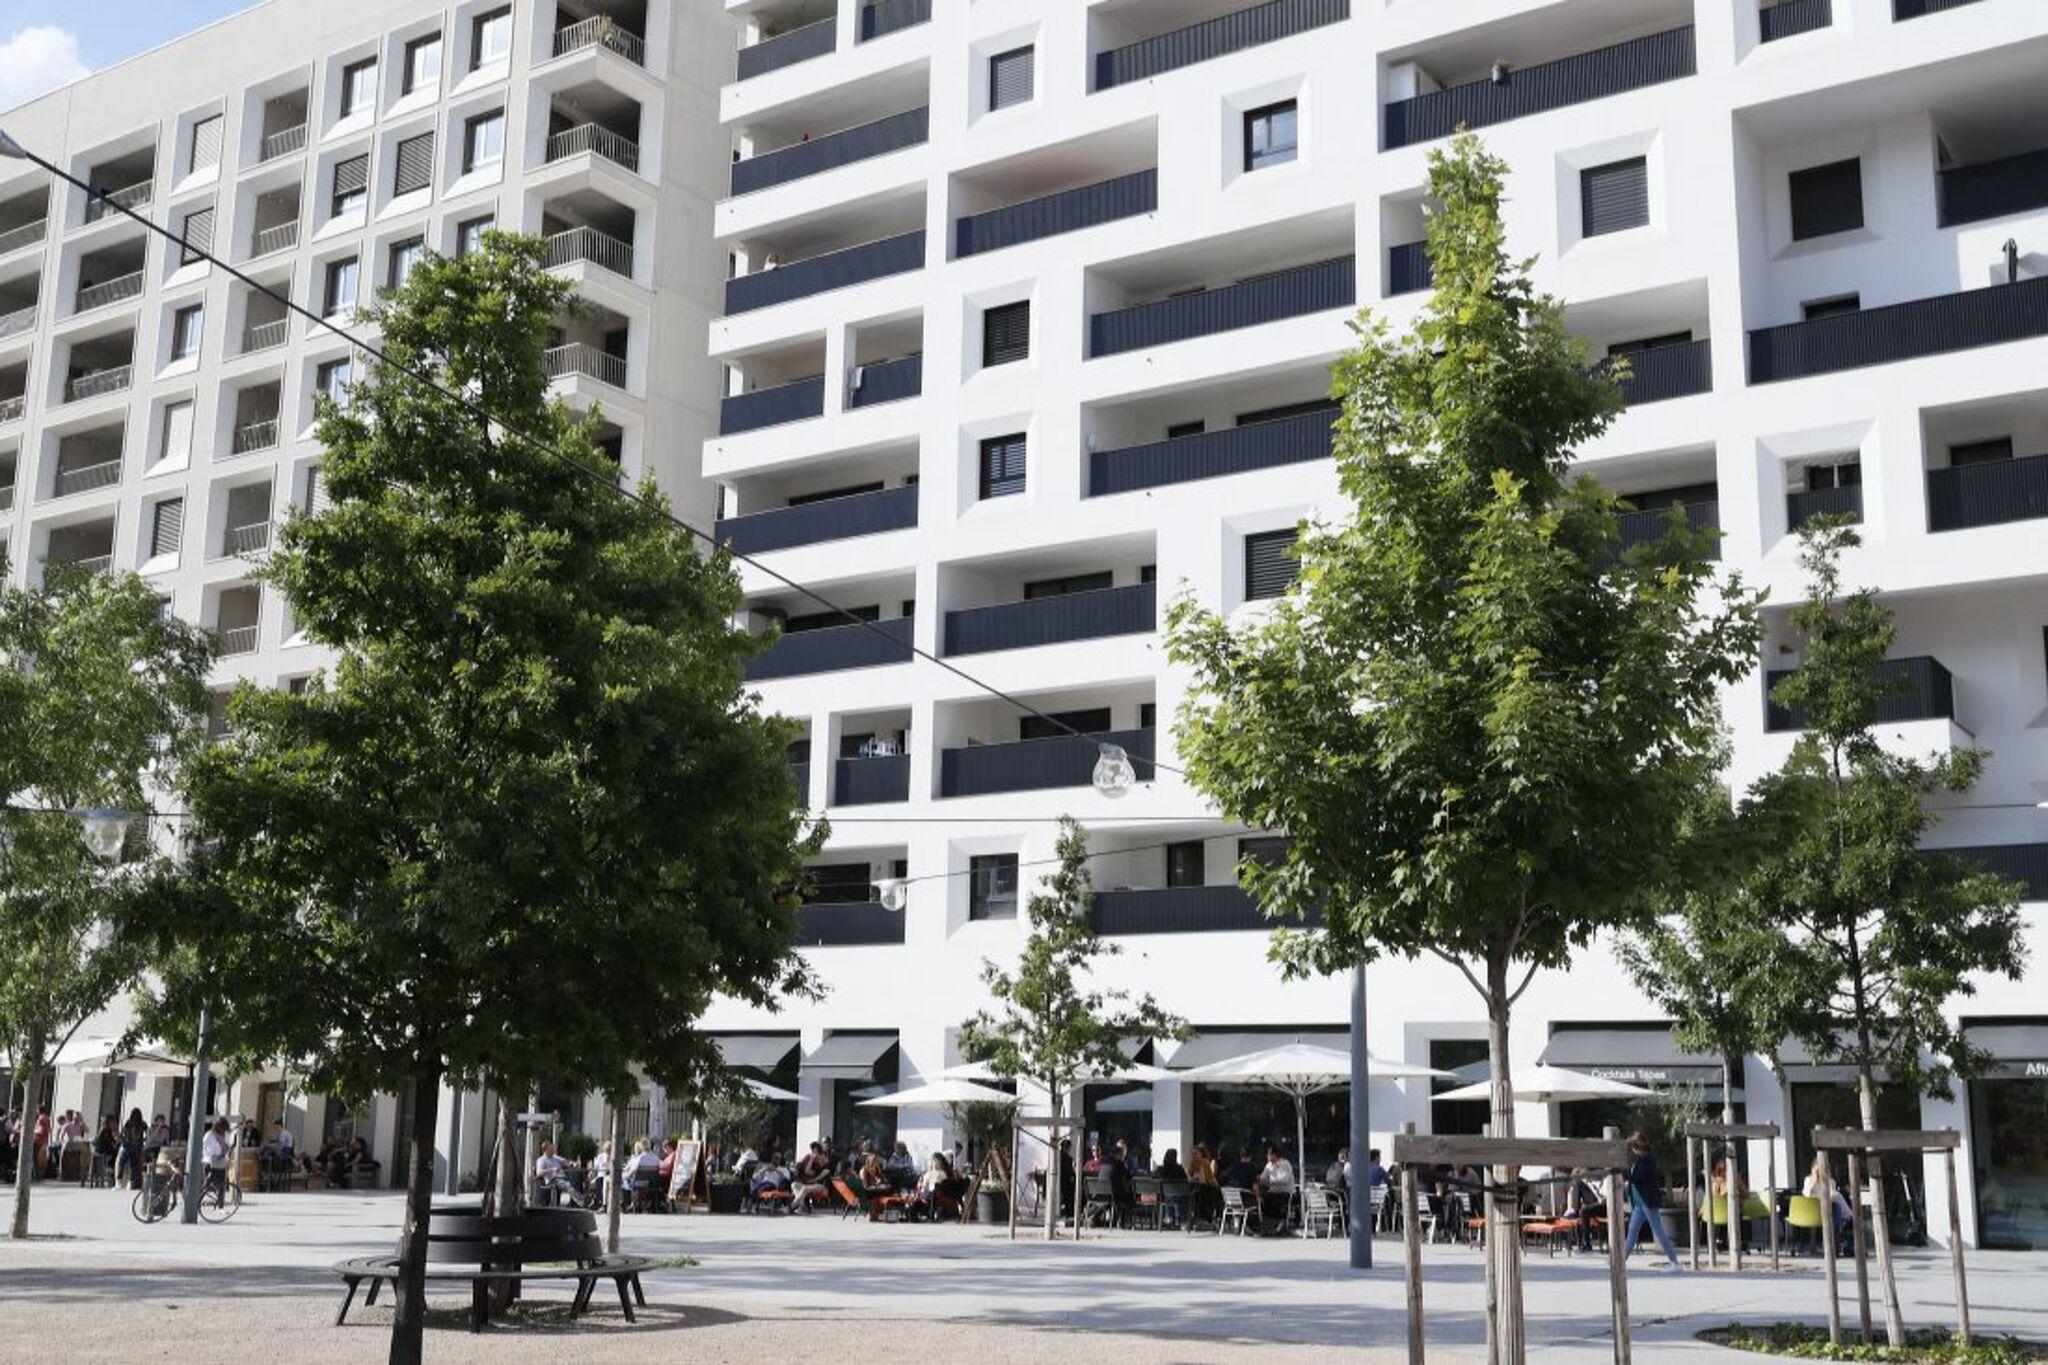 Lyon La Confluence, Ilot A3